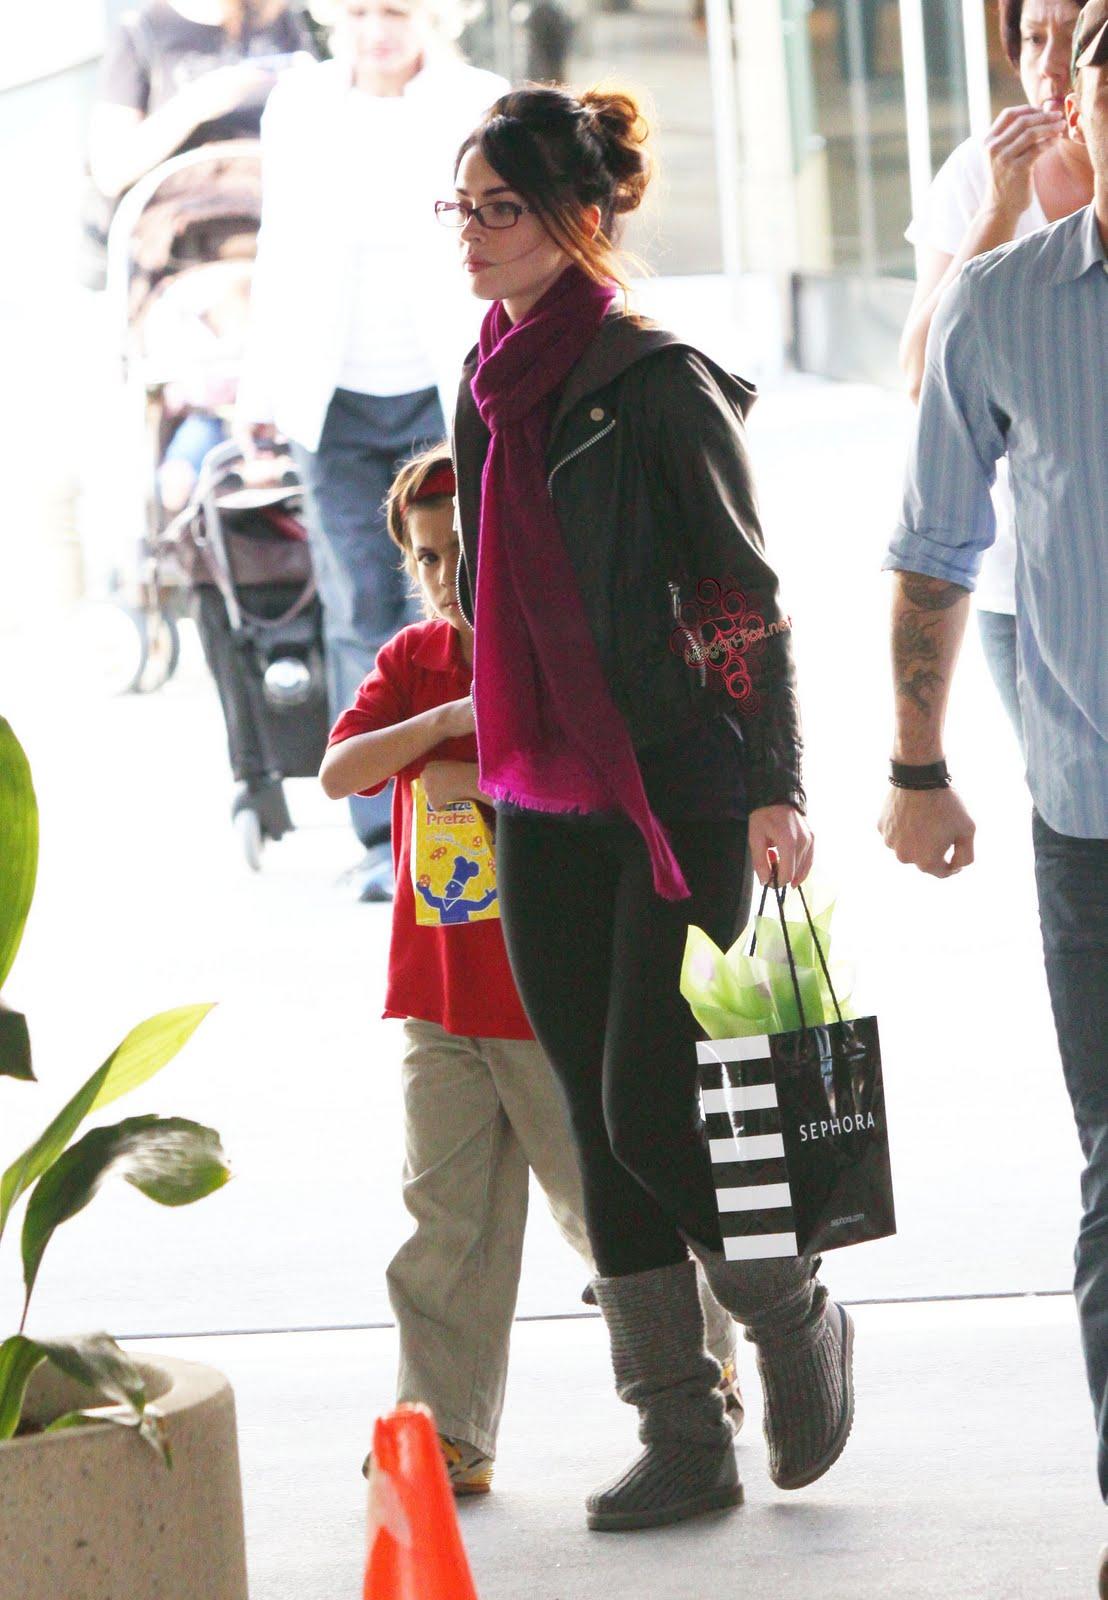 http://2.bp.blogspot.com/_5C0ZRDE7oOM/SwllSPCqdII/AAAAAAAAAUc/wpRu7Yh_Khg/s1600/Megan-fox_net-Sherman-Oaks-mall-2.JPG